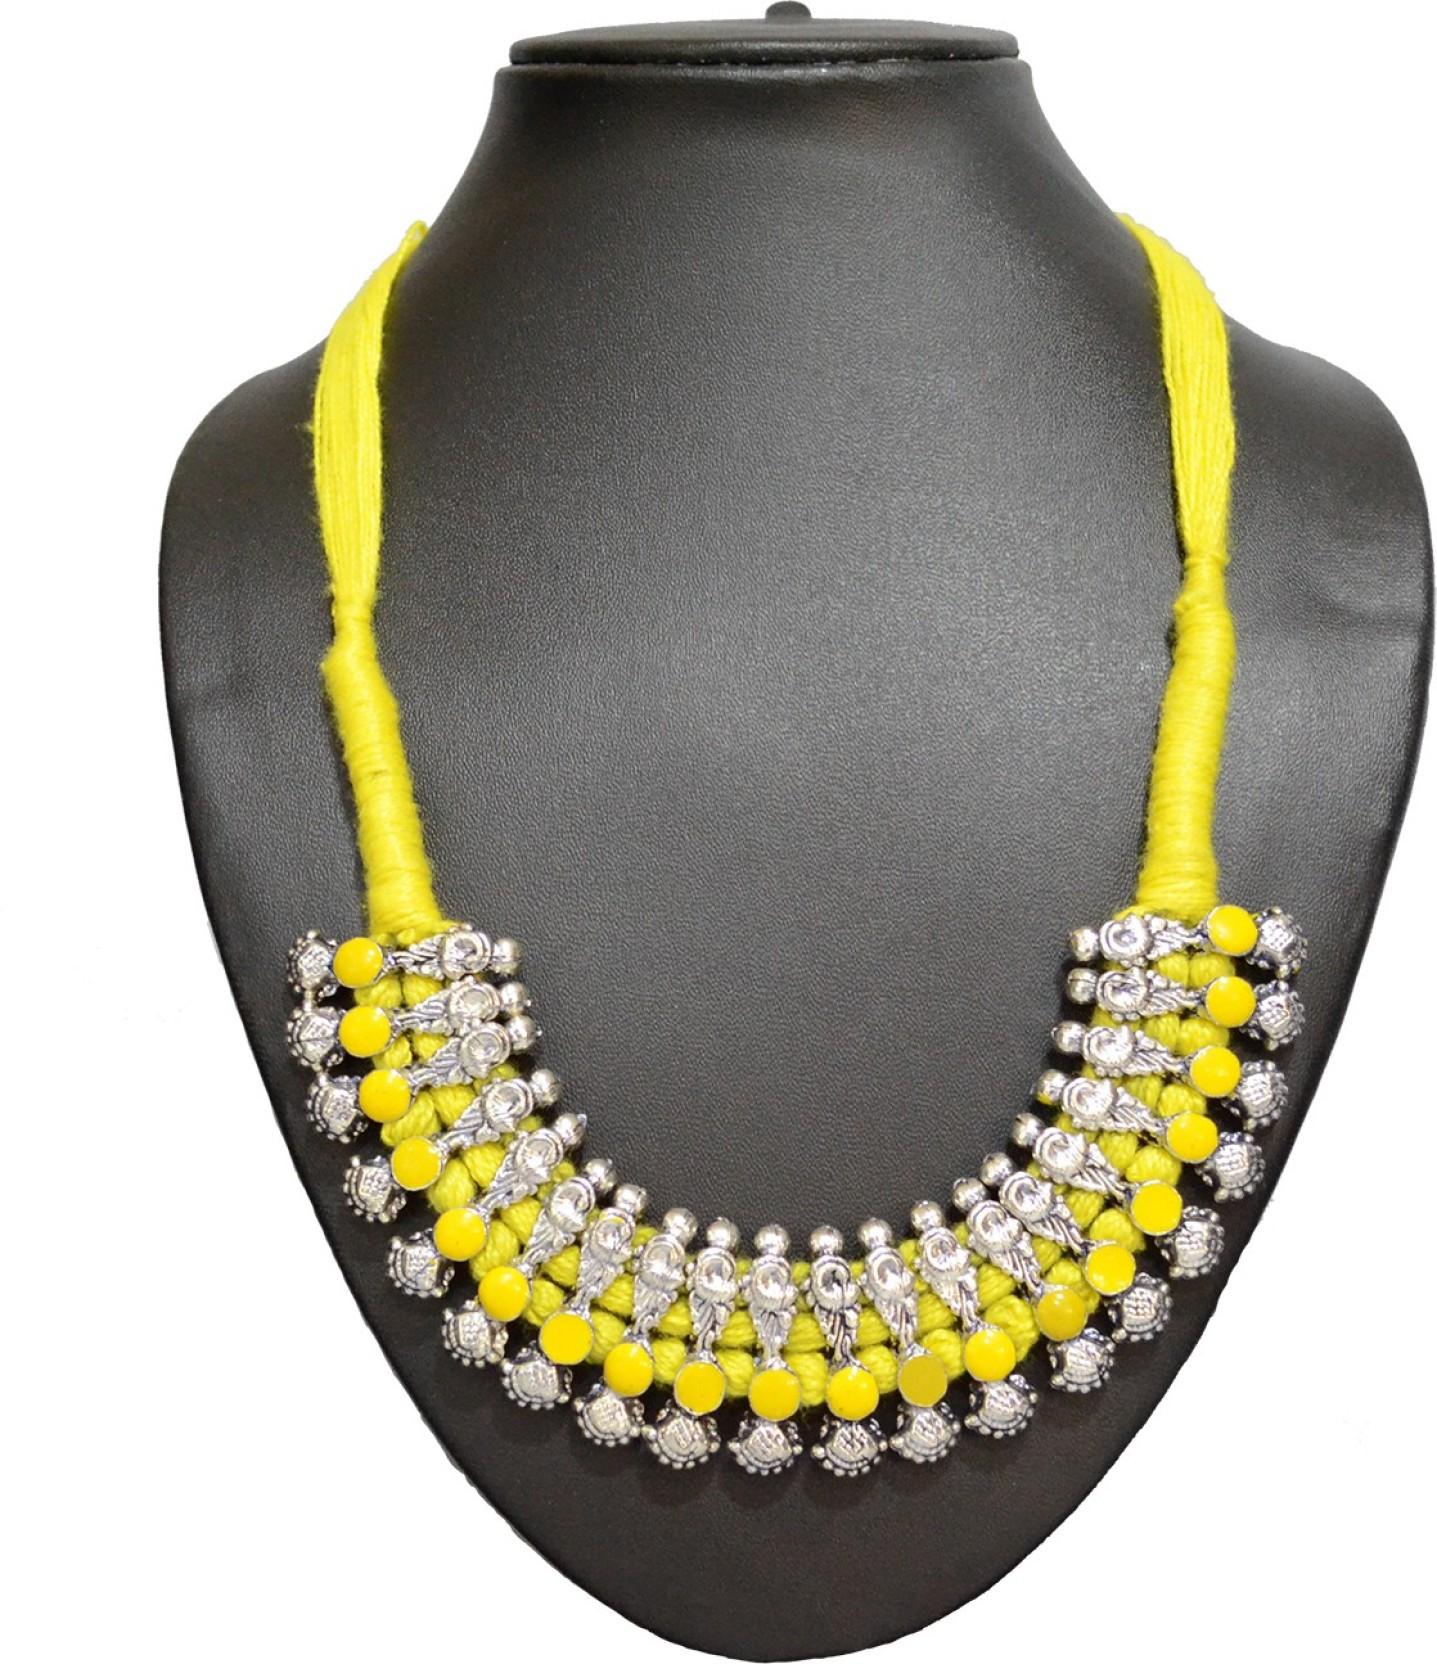 561dc5b570 ... Handmade Tribal Oxidized White Metal Dori Work Jewellery for Girls and  Women. Share